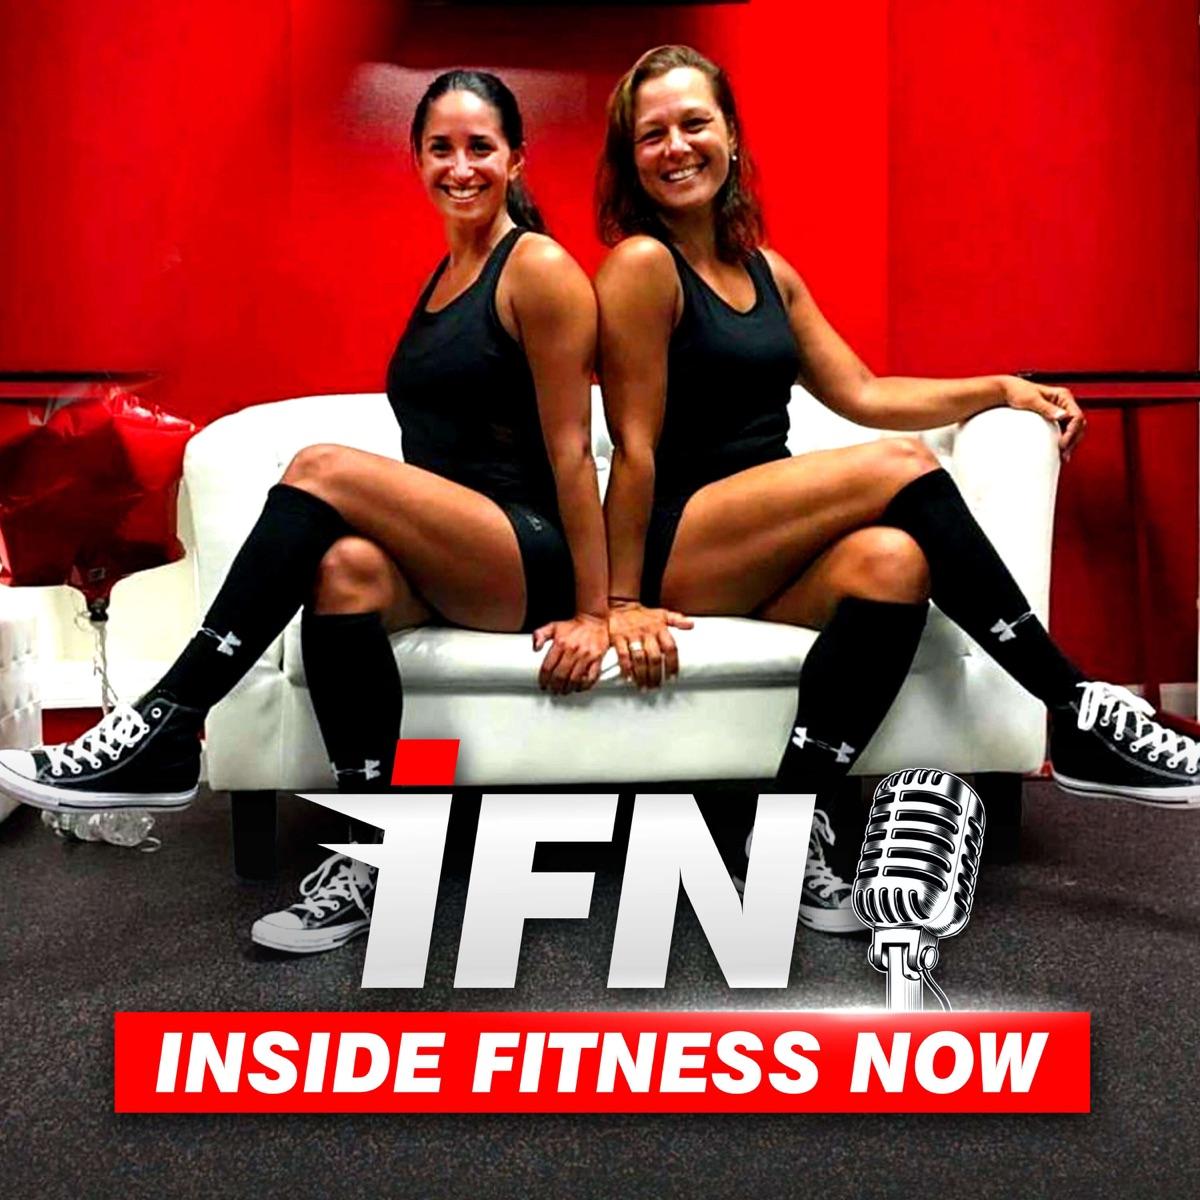 Inside Fitness Now!